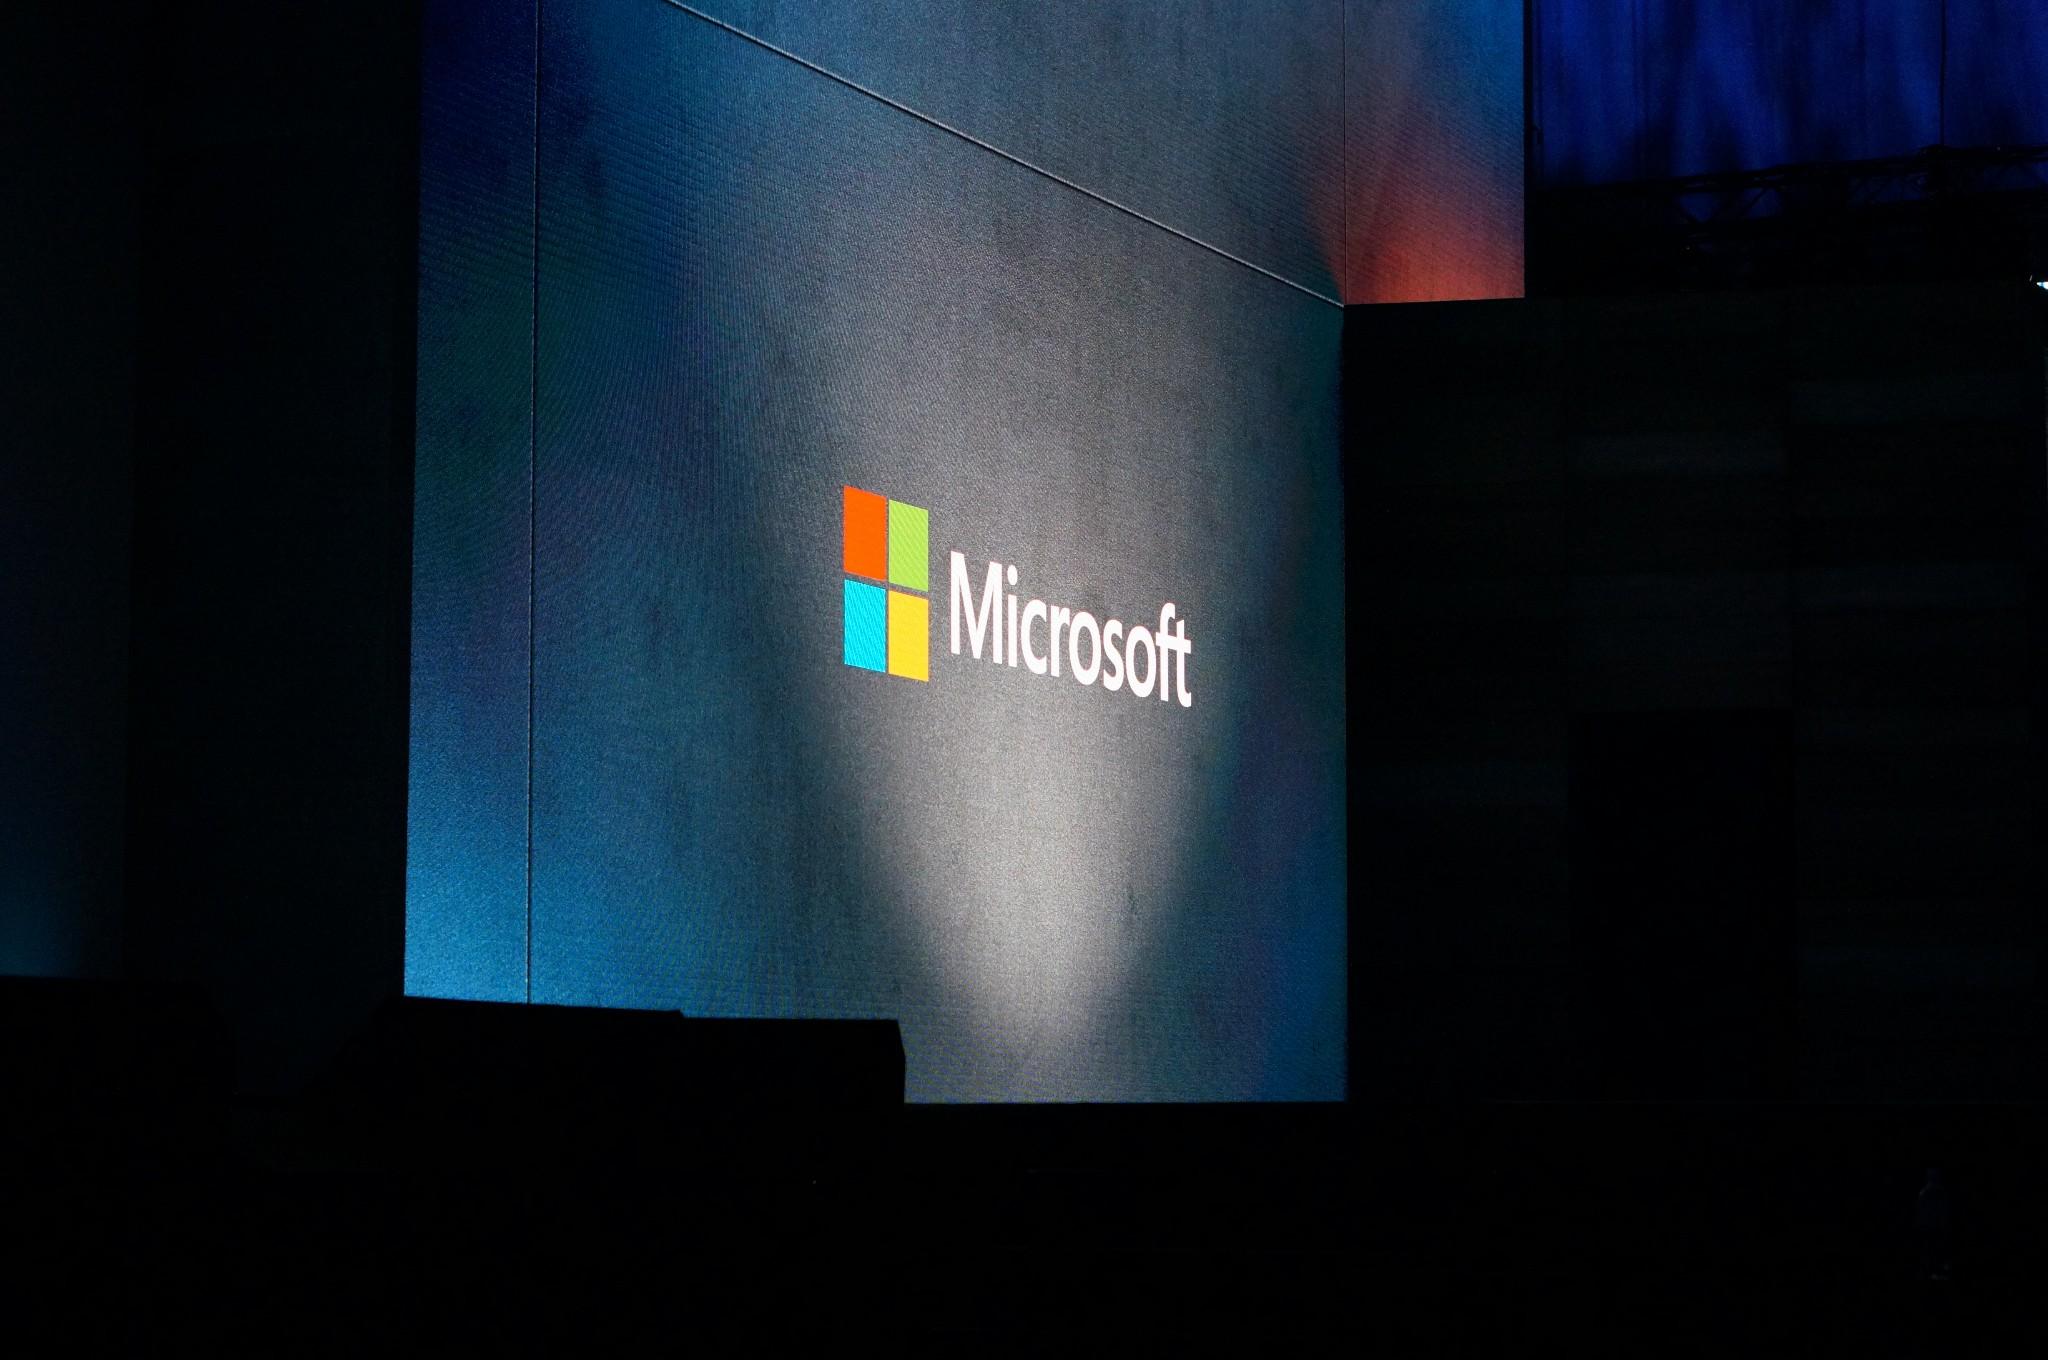 Microsoft Partner - cover